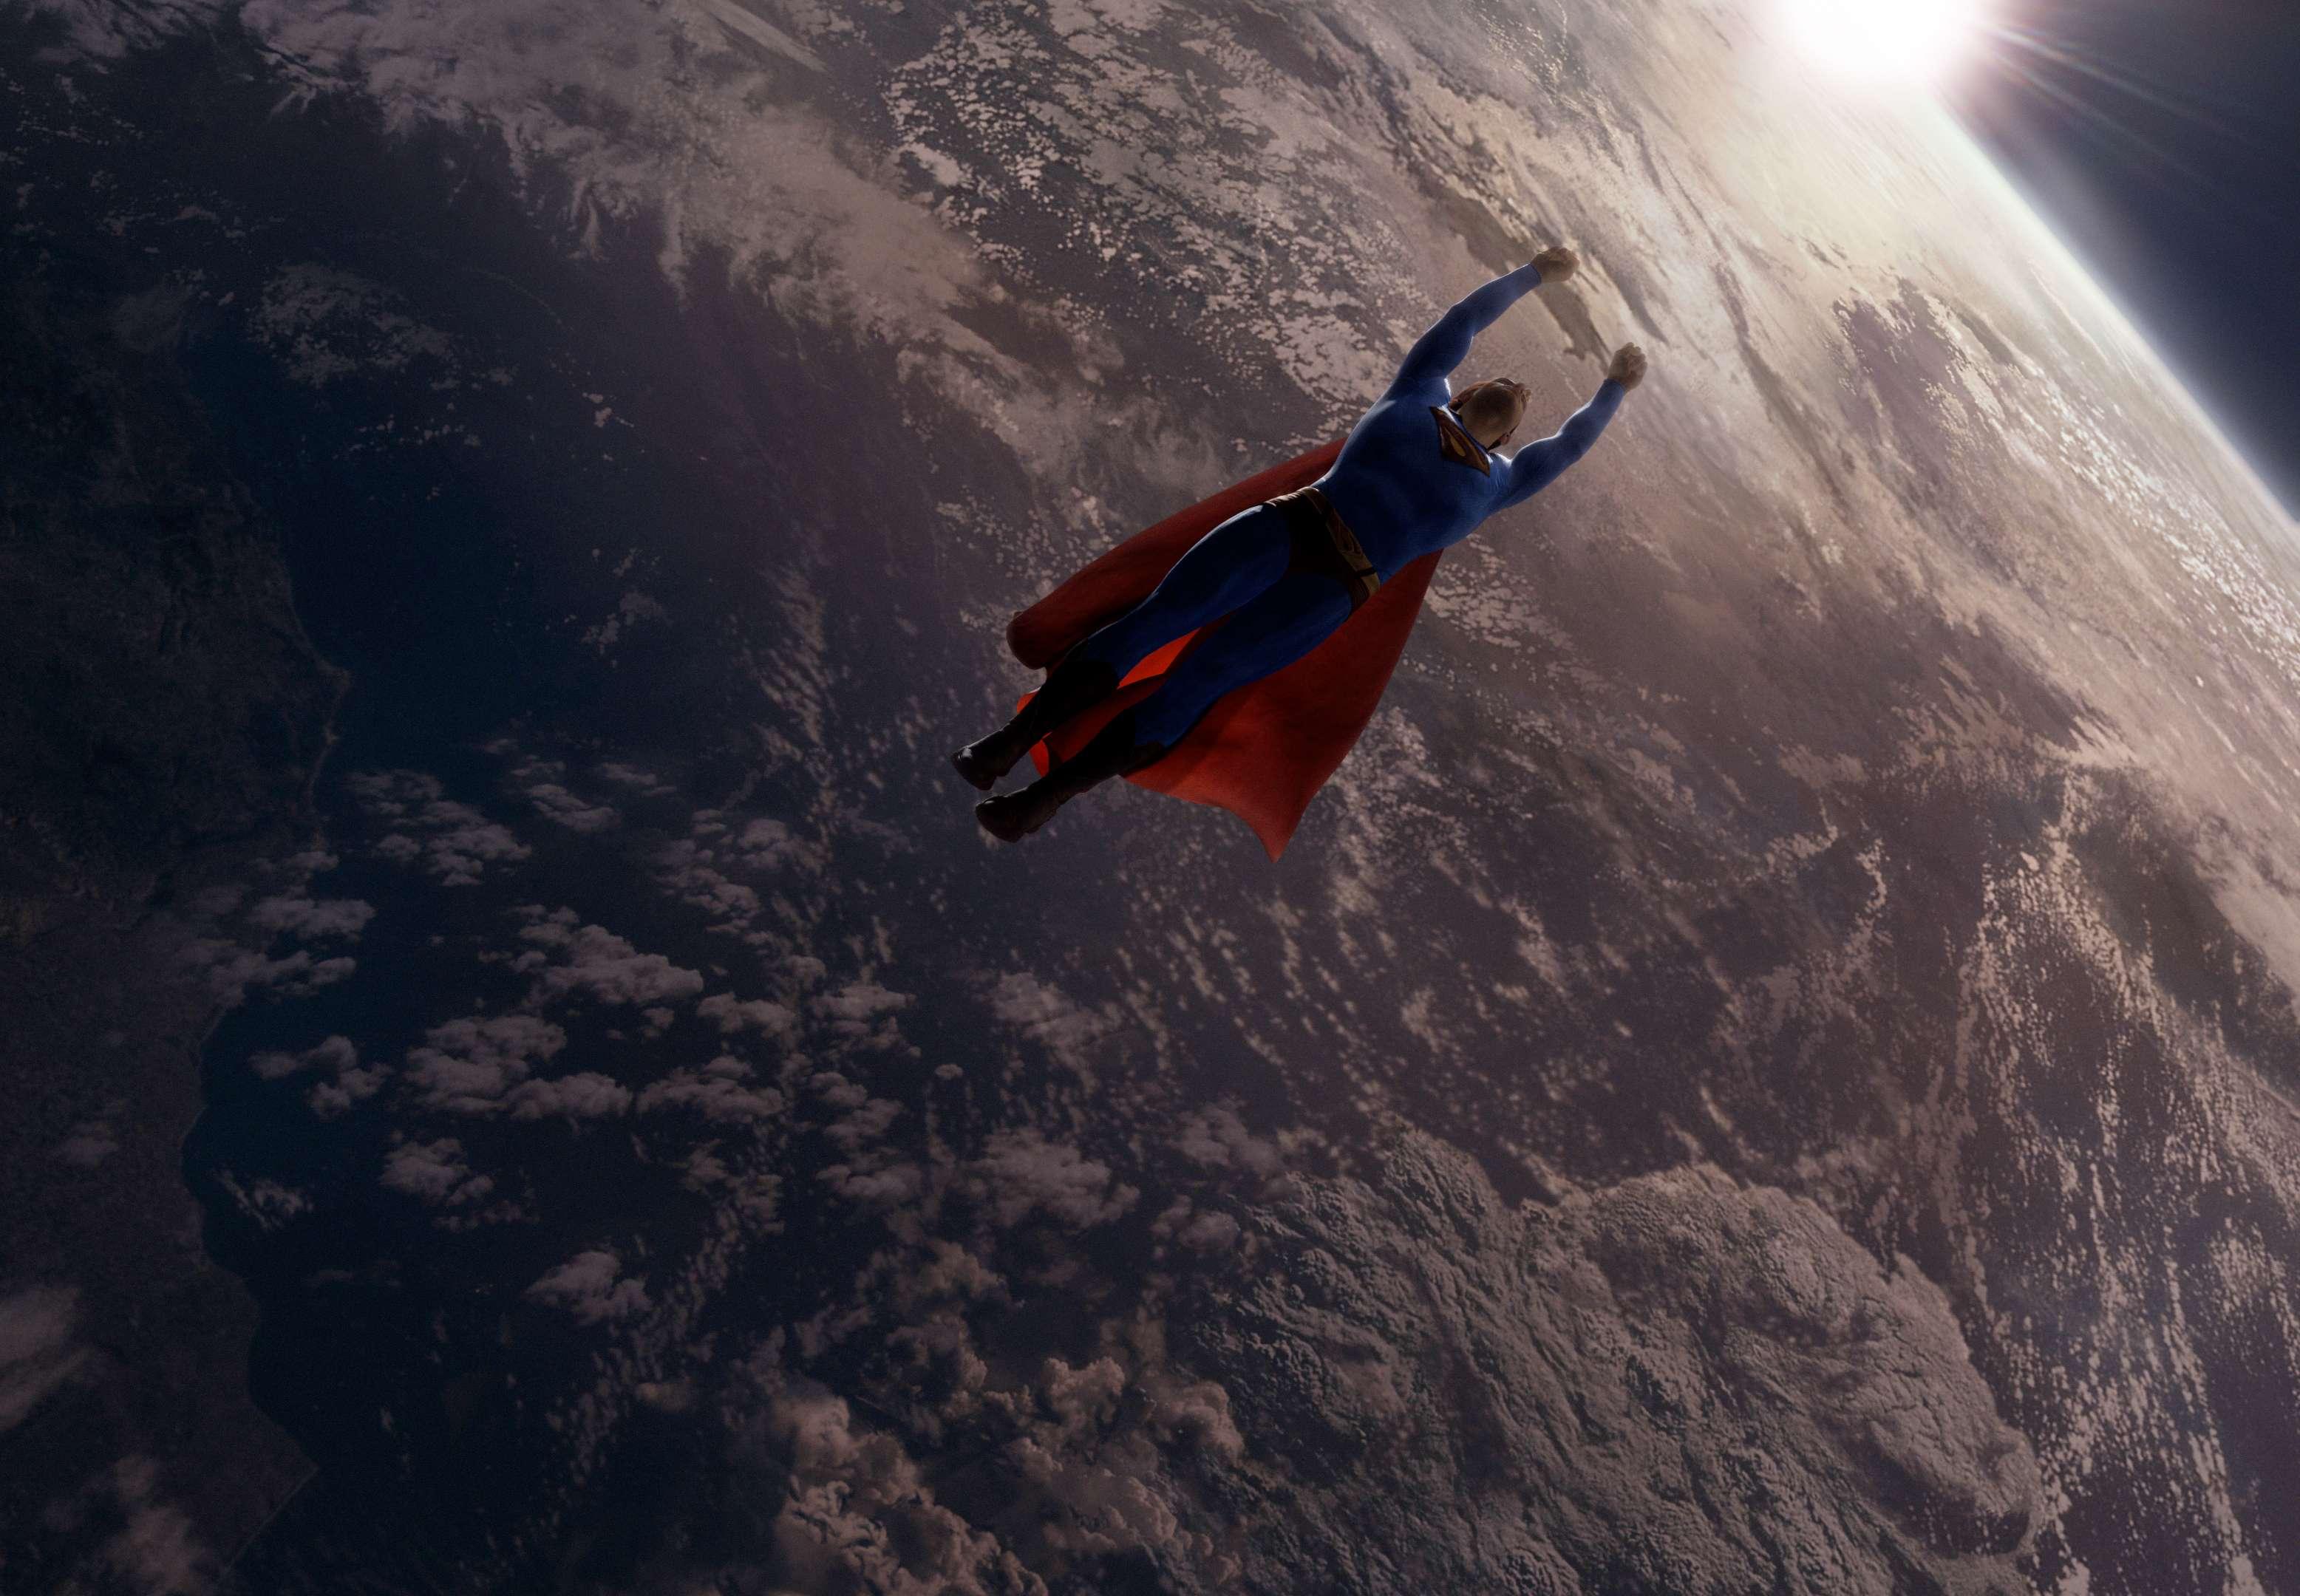 Superman VS. the Myth of Aristocracy